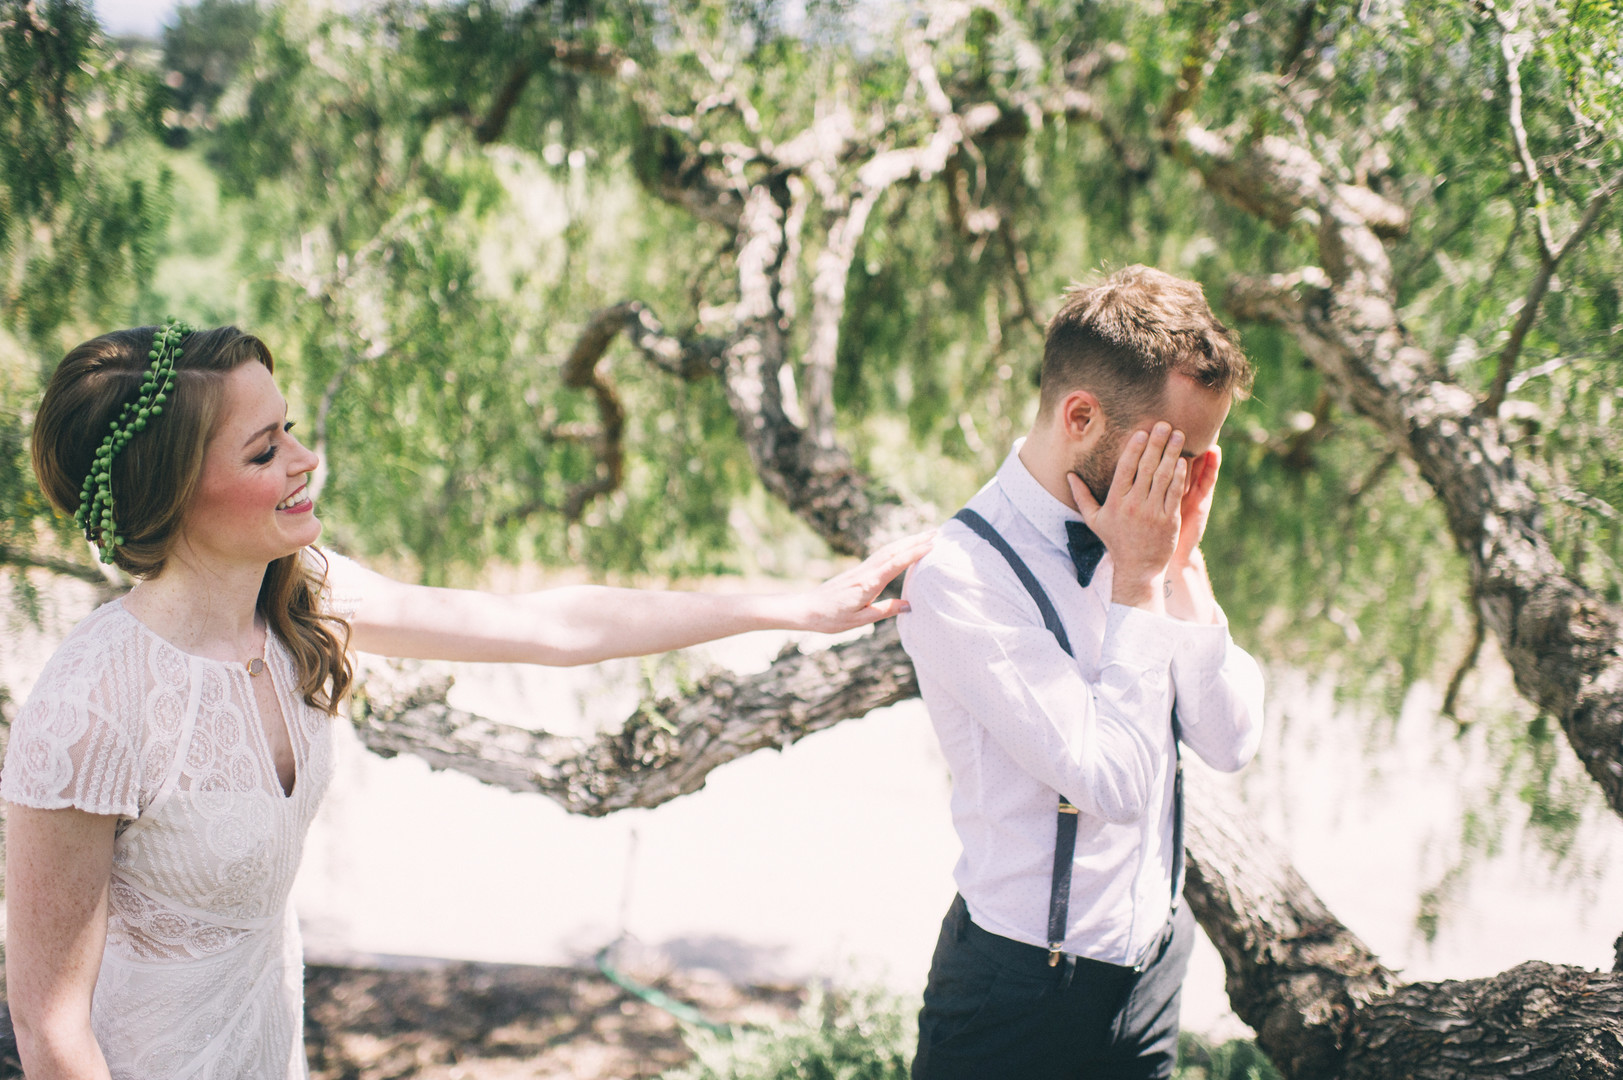 www.santabarbarawedding.com | Sarah Katherine Davis Photography | Santa Barbara Museum of Natural History | Wild Heart Events | BHLDN | Pretty Please Beauty | Bride Surprises Groom